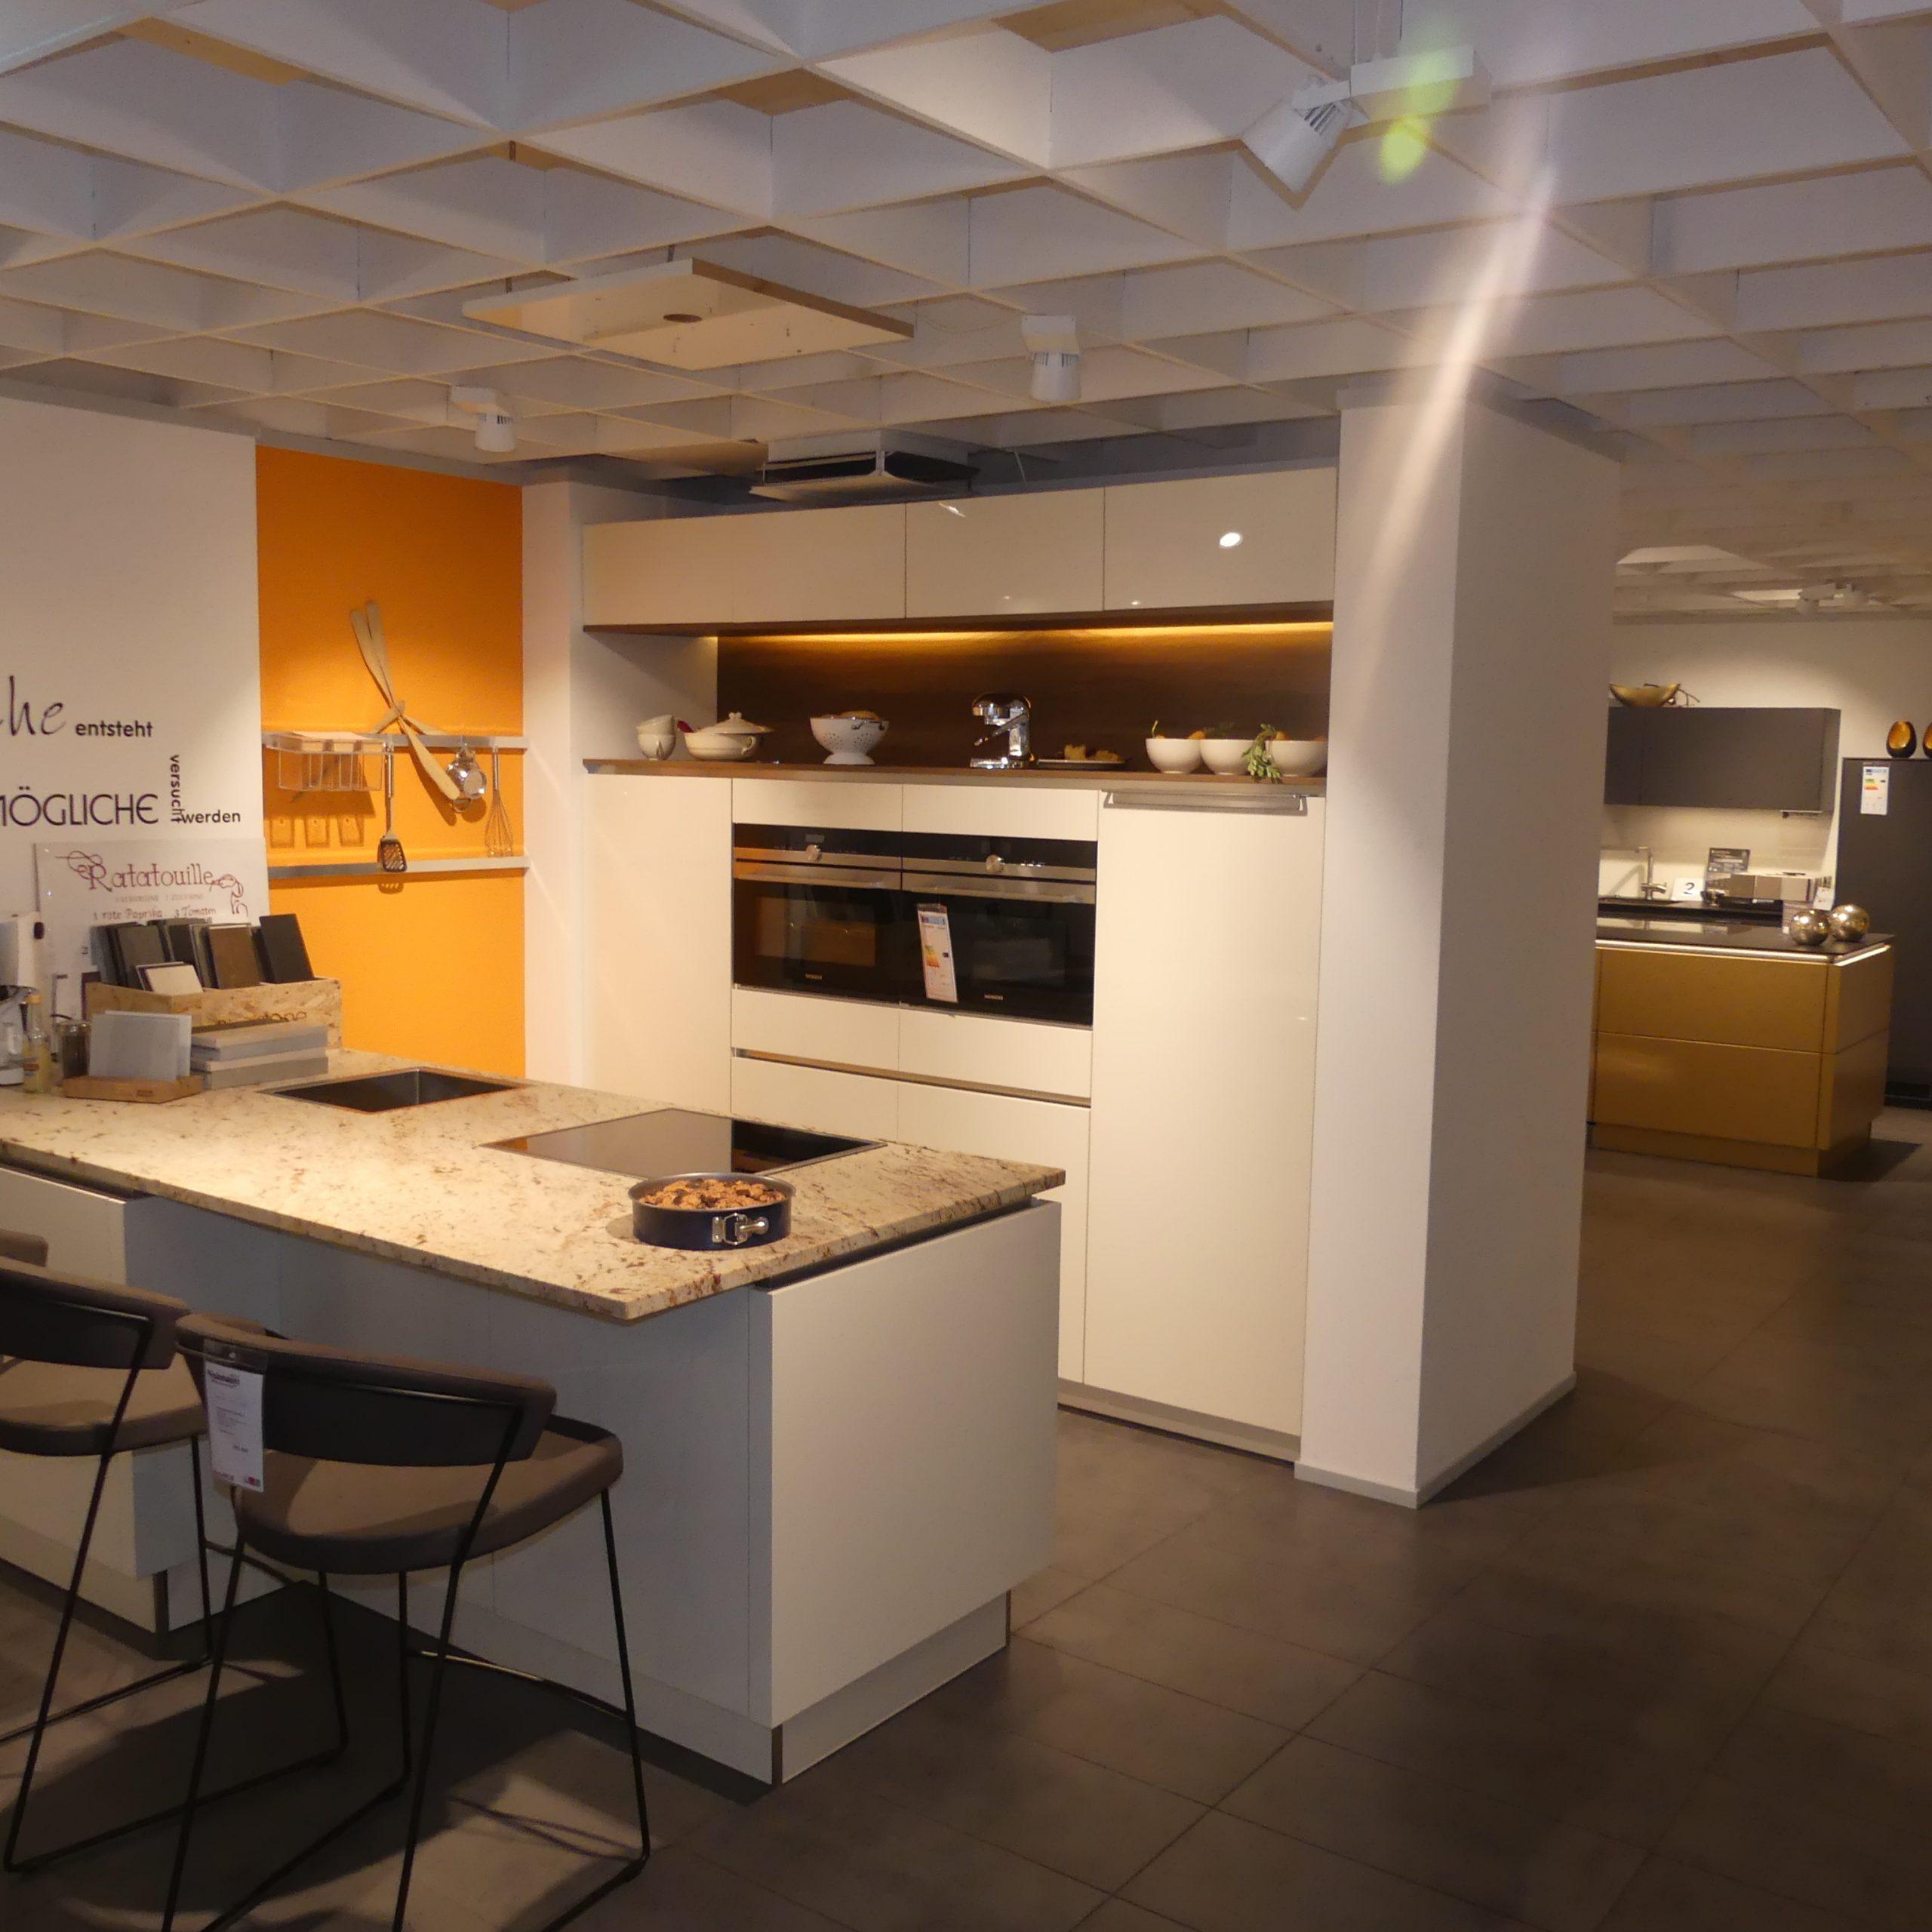 Full Size of Siematic Musterküche Abverkauf Häcker Musterküche Next125 Musterküche Bulthaup Musterküche Küche Musterküche